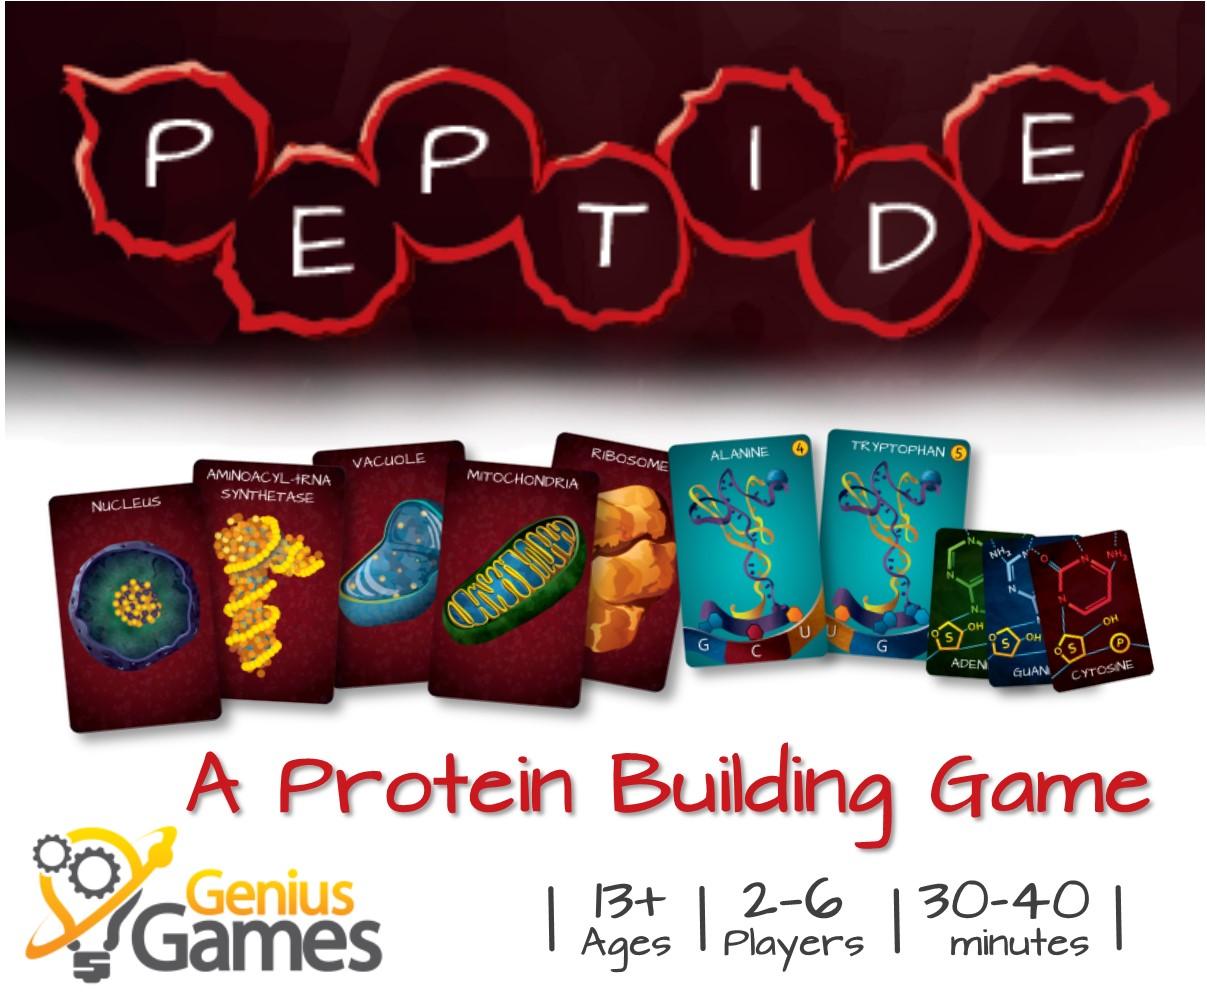 Peptide on Kickstarter